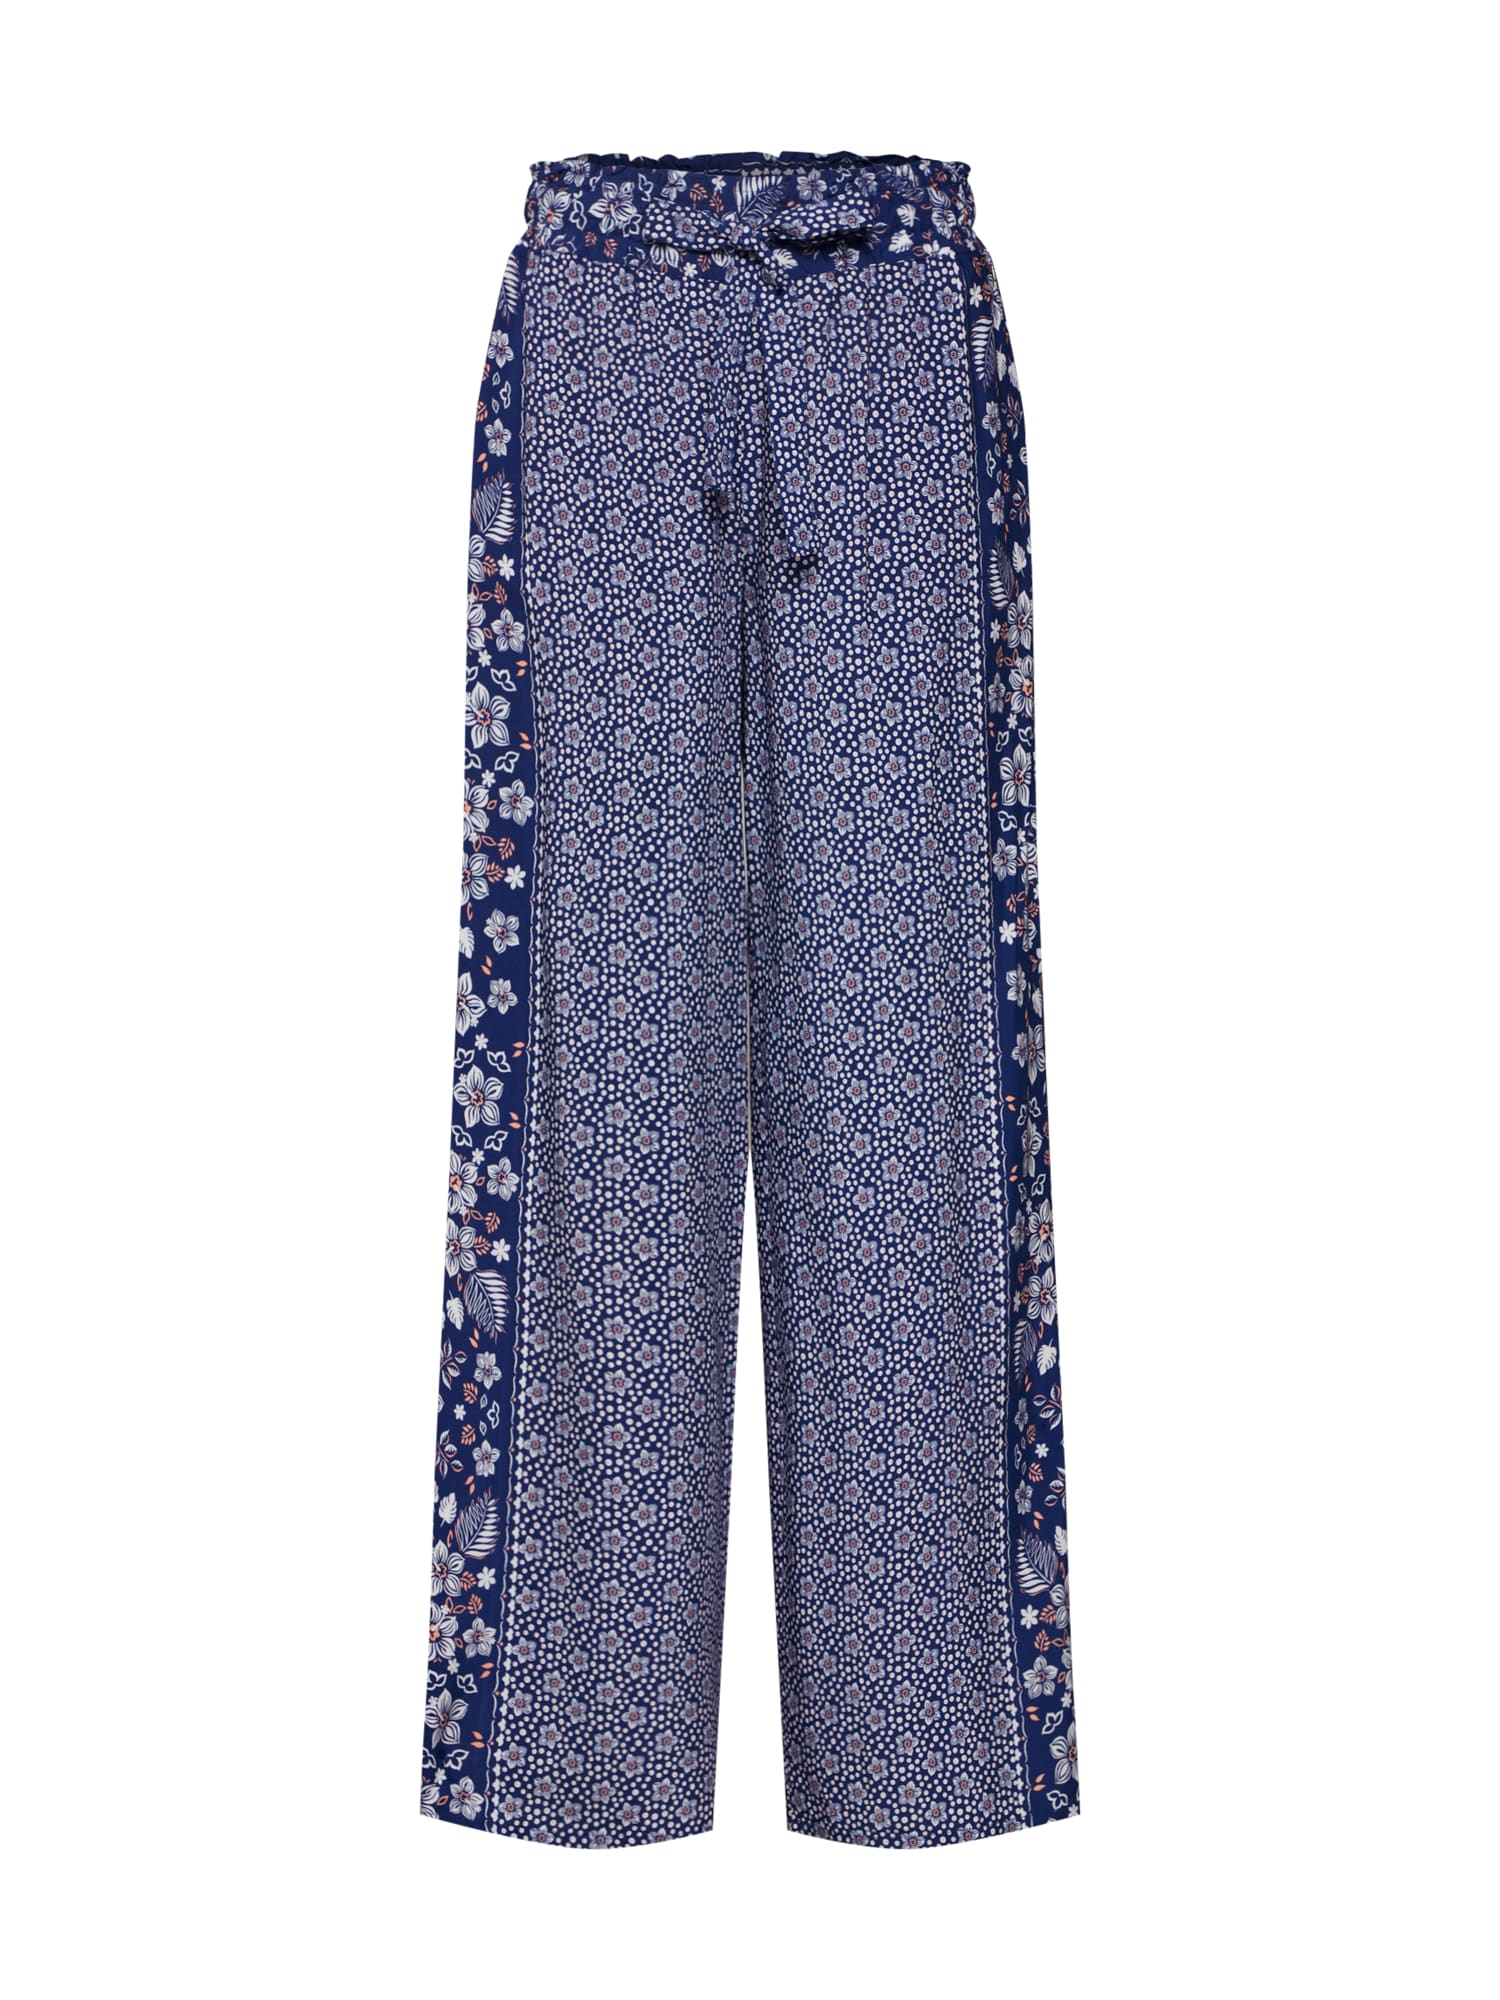 Palazzohose 'Lis' | Bekleidung > Hosen > Palazzohosen | Pepe Jeans